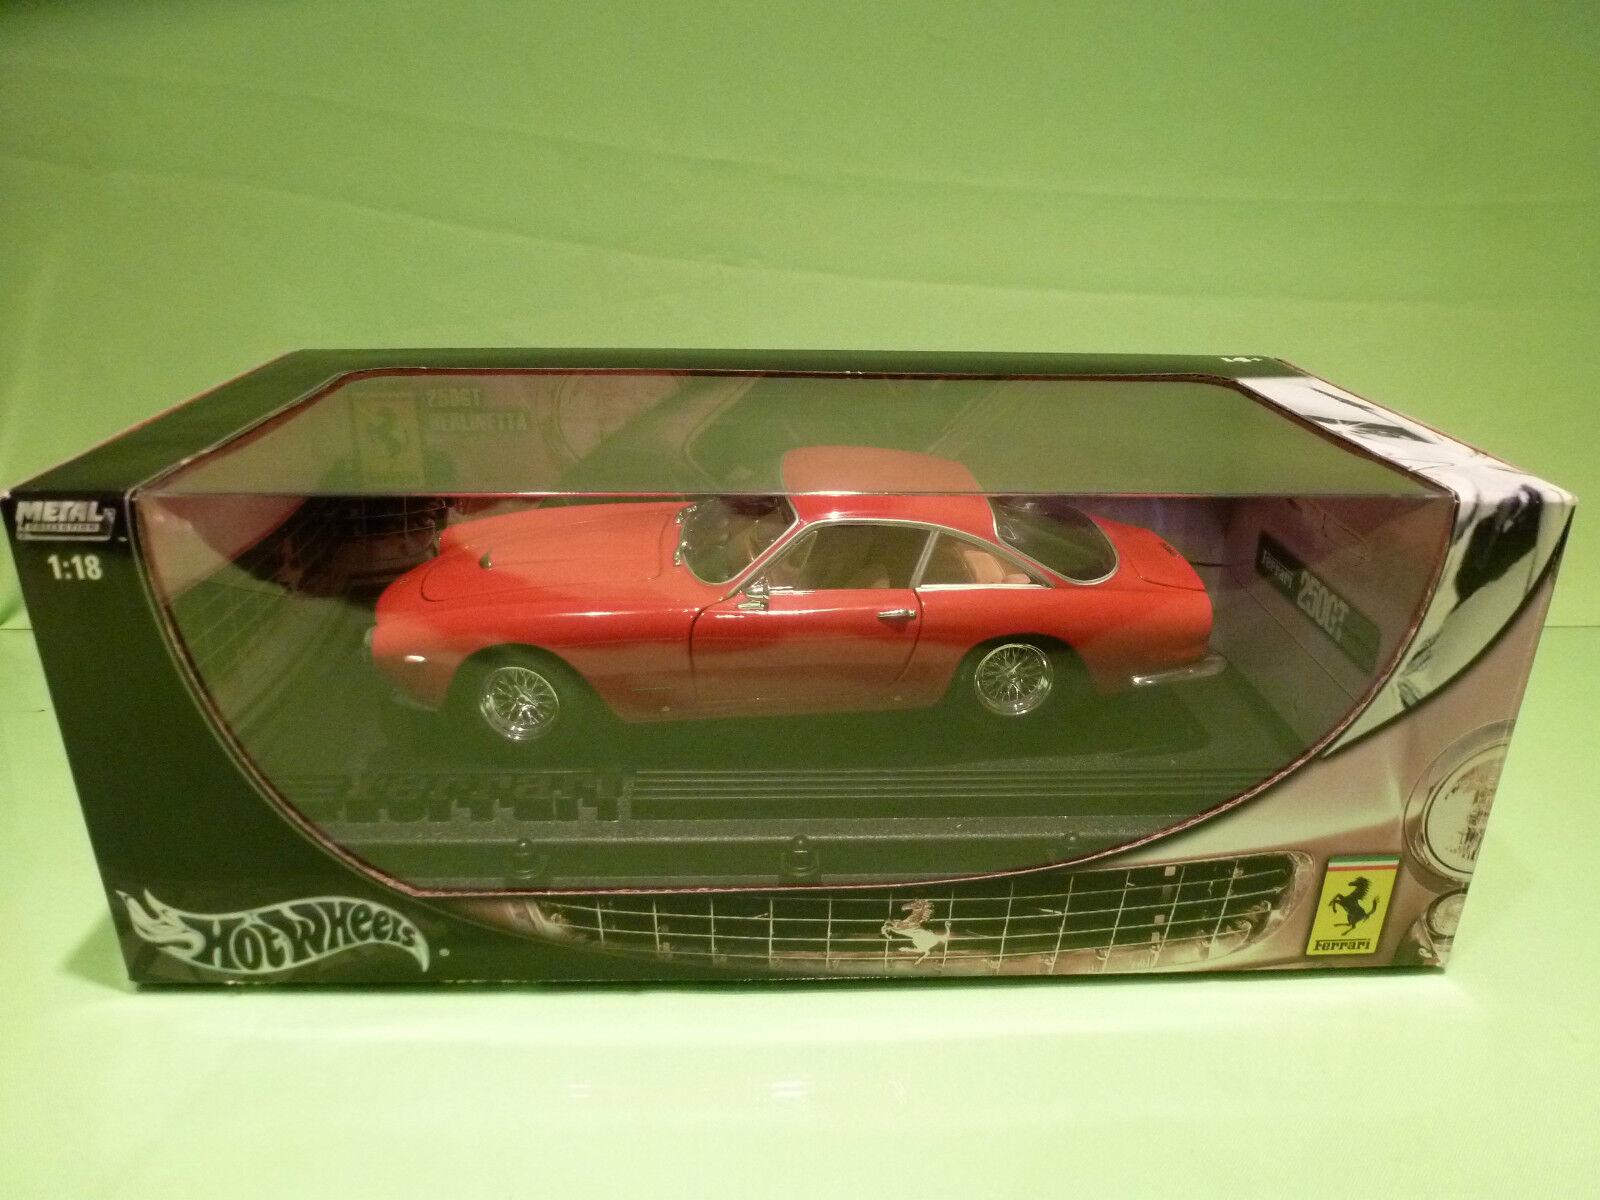 HOTWHEELS B6053  FERRARI 250 GT BERLINETTA 1 18 - RARE SELTEN - NEAR MINT IN BOX